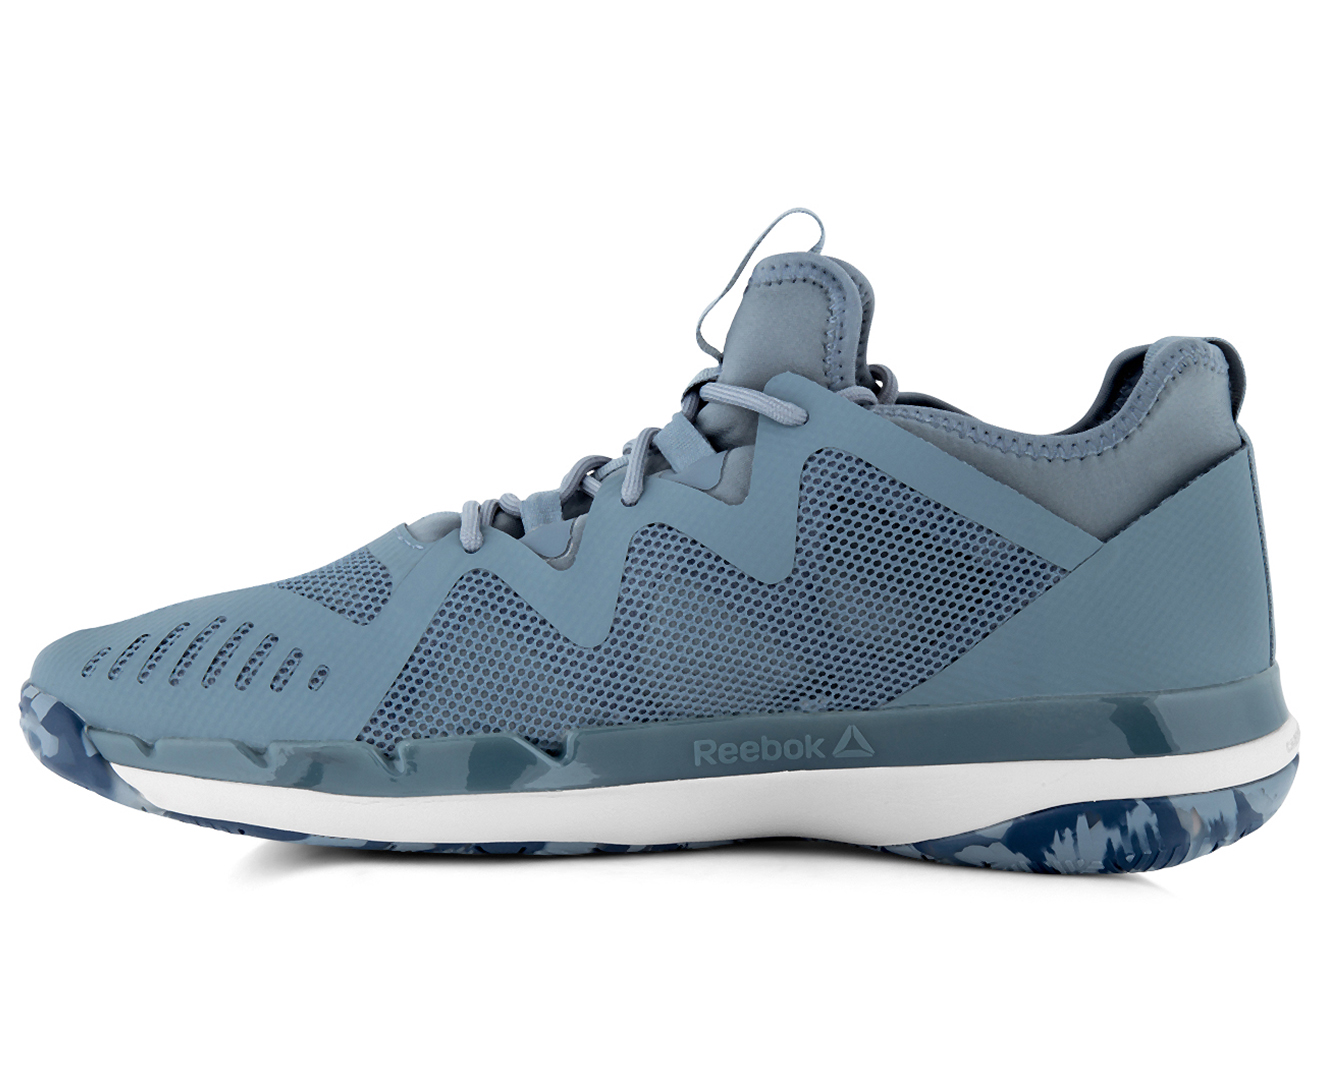 timeless design f2d5a bbc6b Reebok Men's Ultra 4.0 LM Shoe - Dust/Stone/Indigo/White